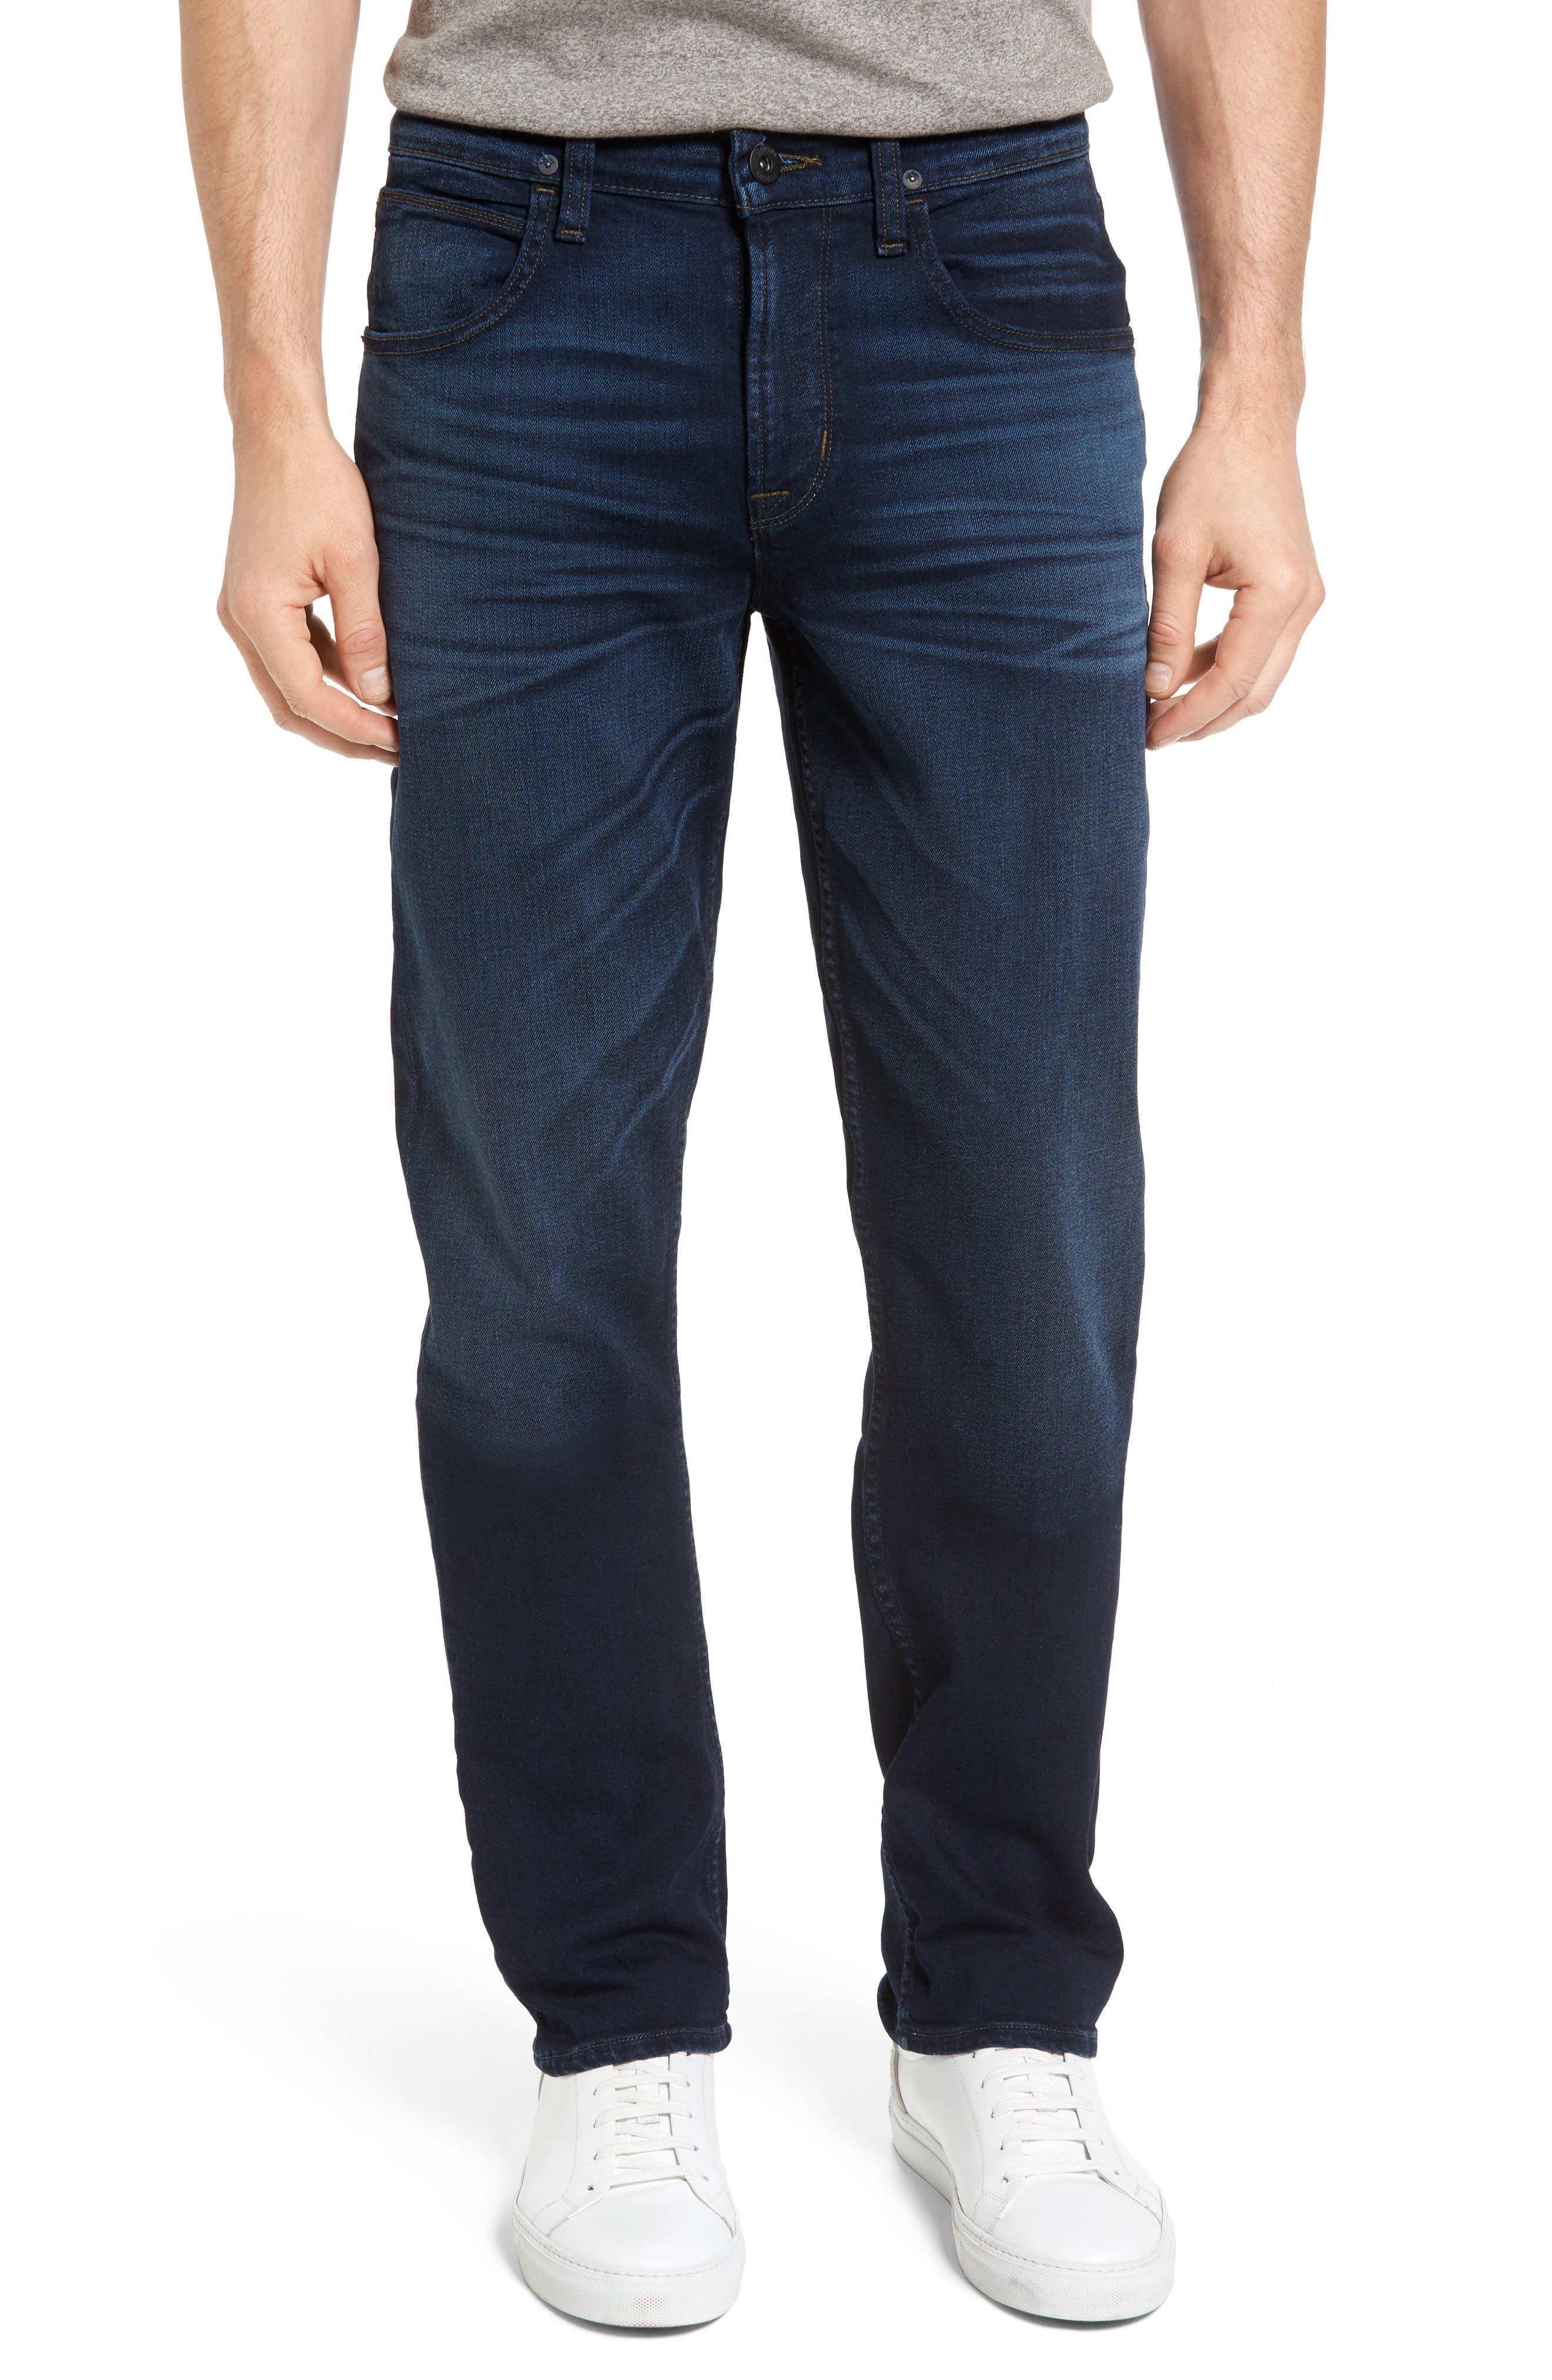 Byron Slim Straight Leg Jeans,                         Main,                         color, 401